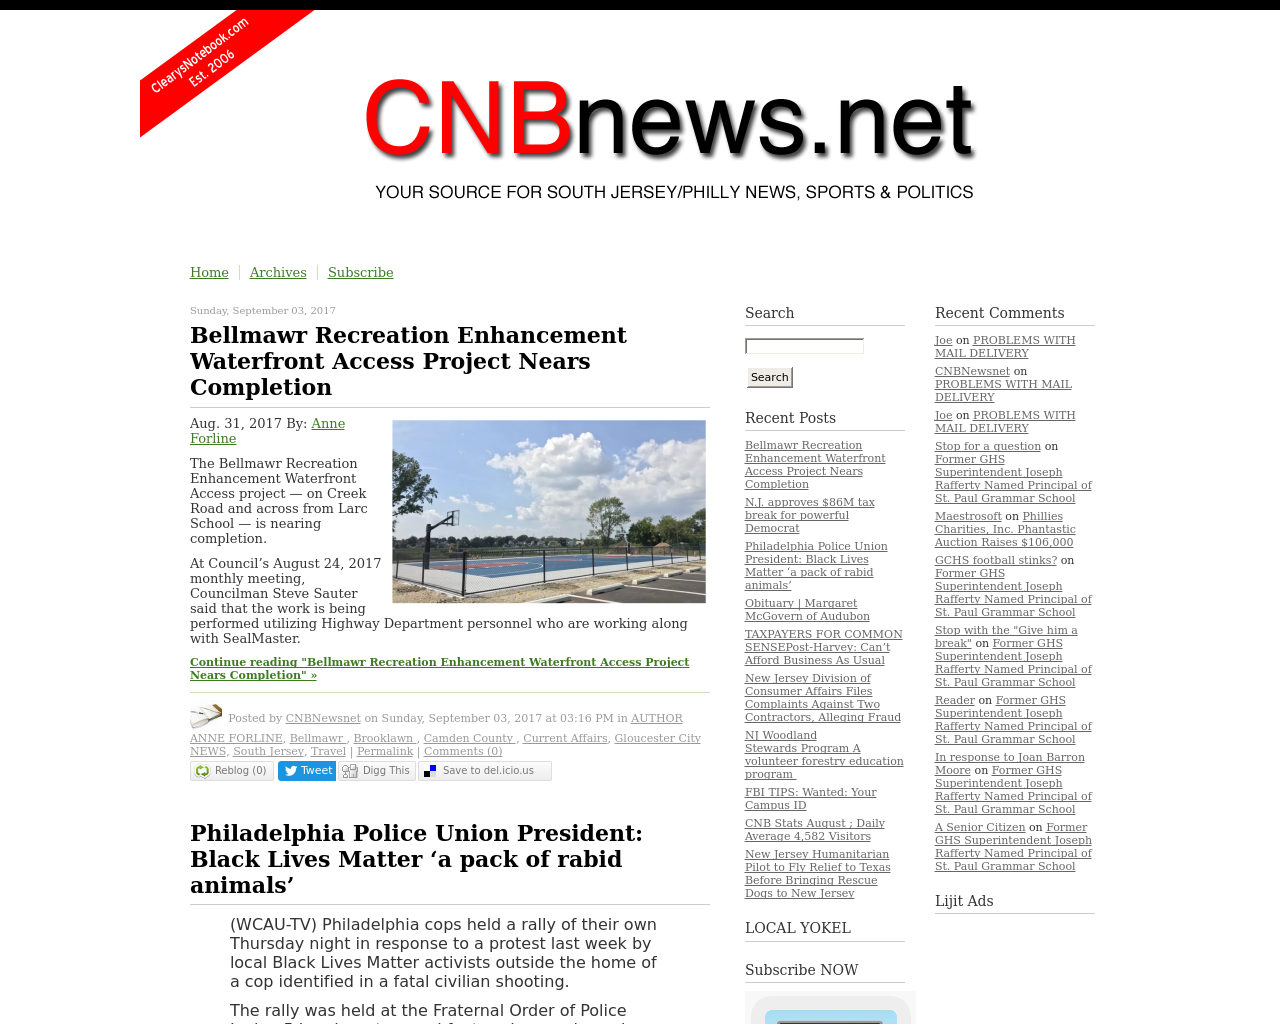 Gloucestercitynews.net-Advertising-Reviews-Pricing